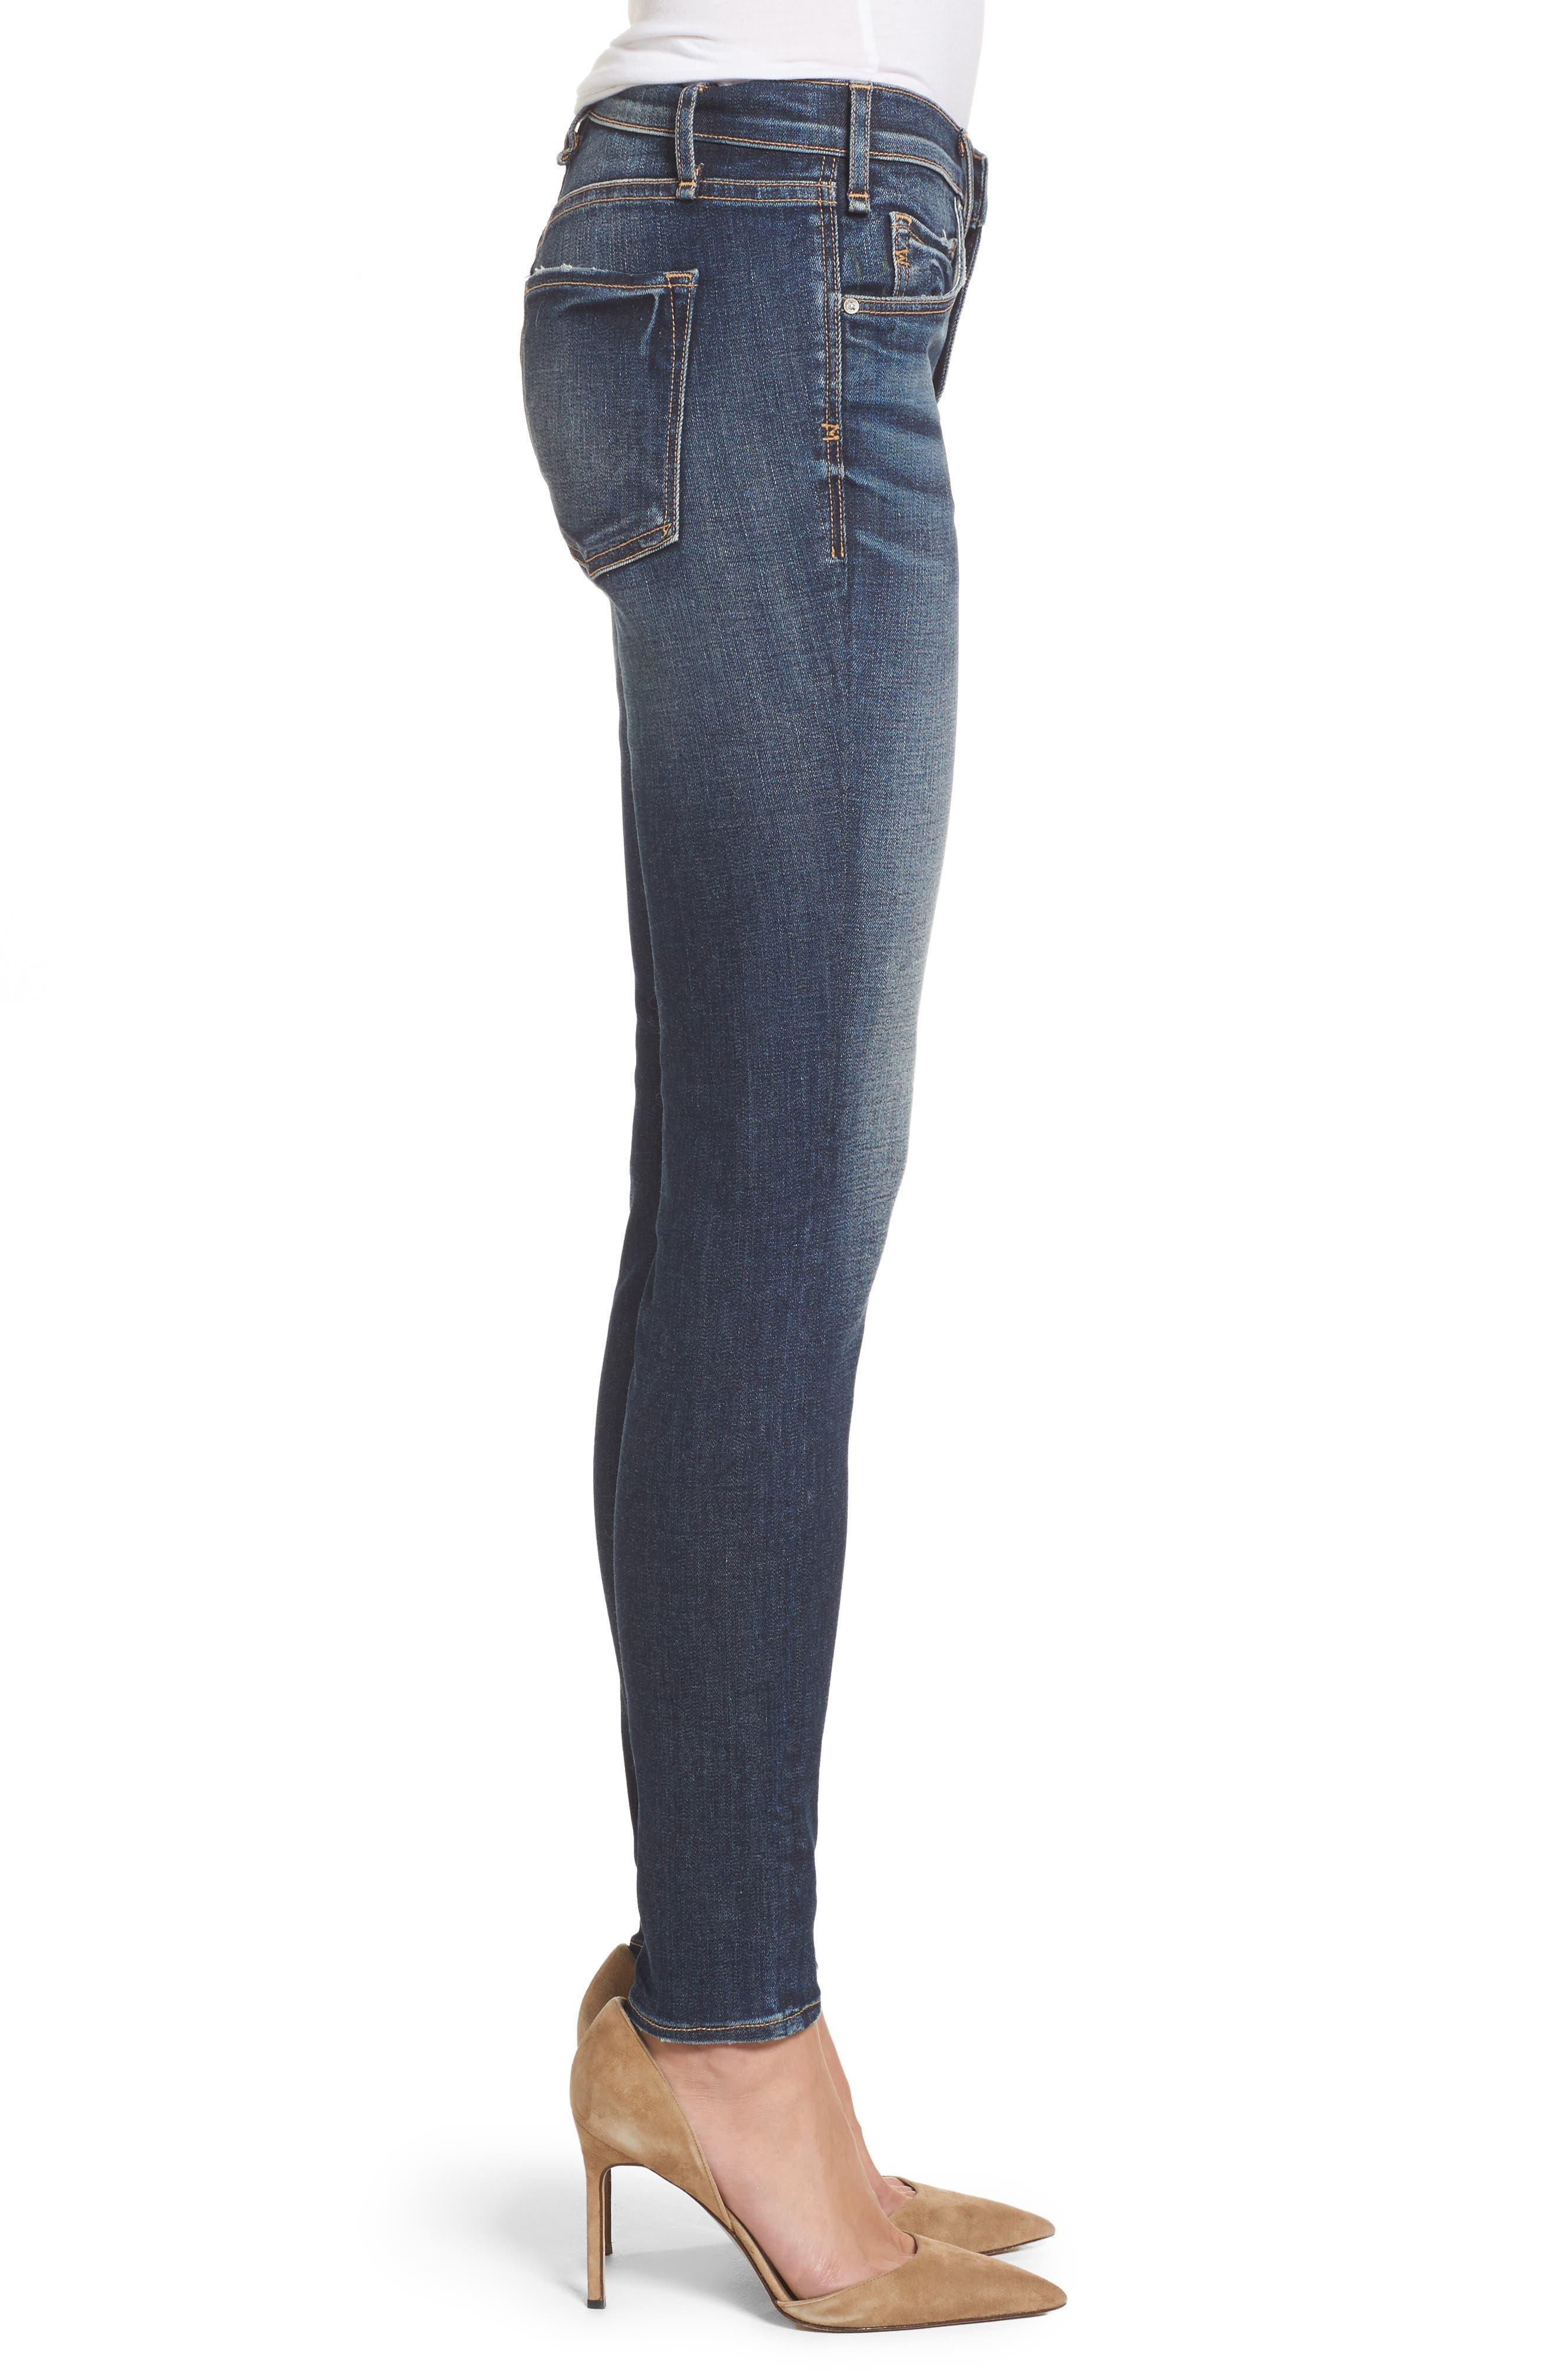 Alternate Image 3  - McGuire Newton High Waist Skinny Jeans (One Thousand Suns)